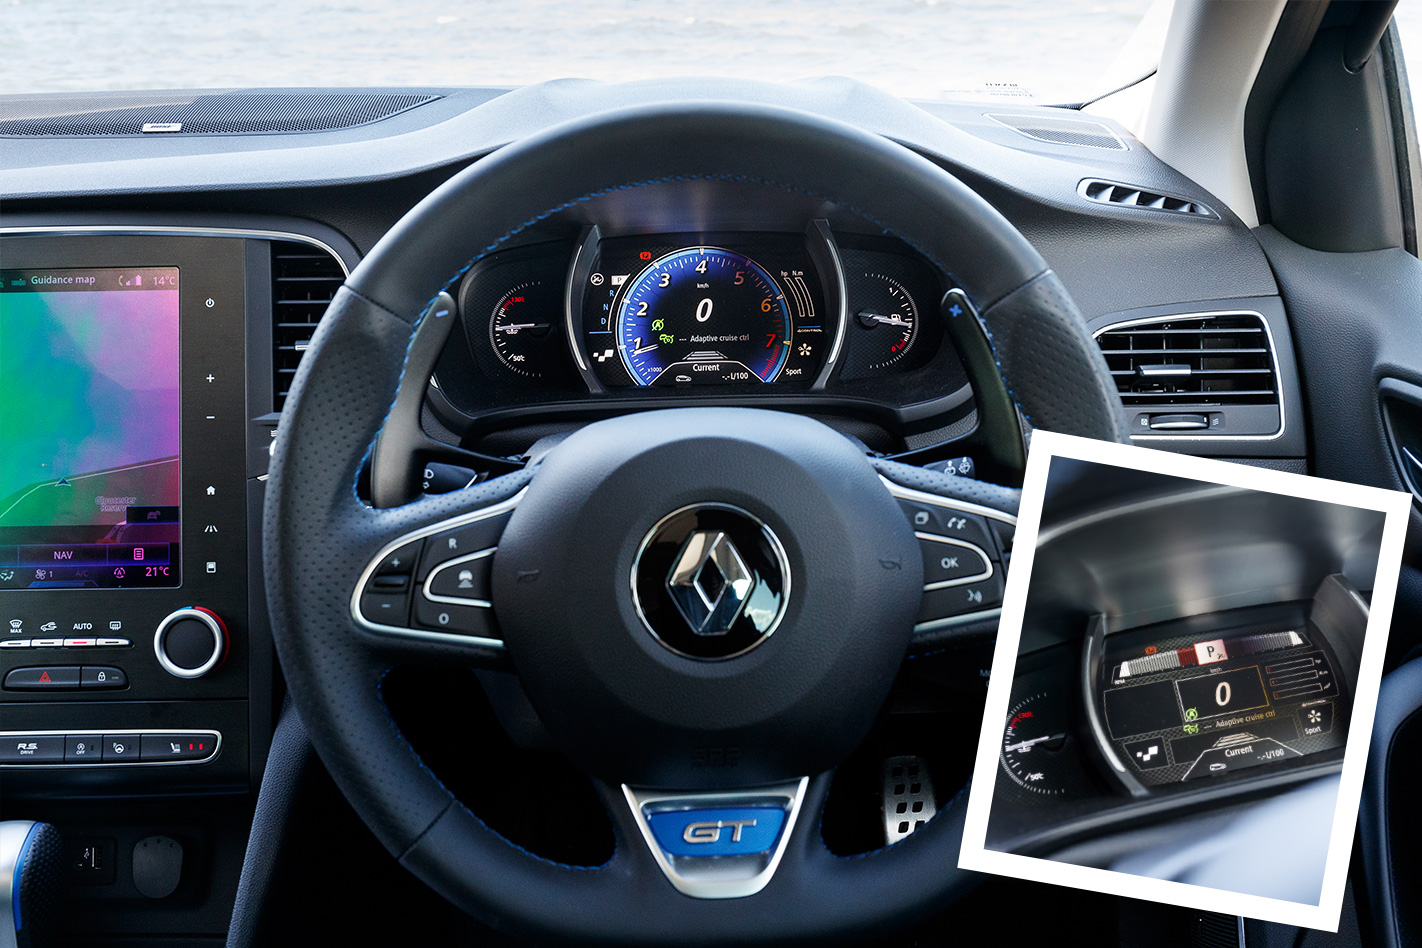 Renault Megane Gt Wagon 2017 Long Term Review